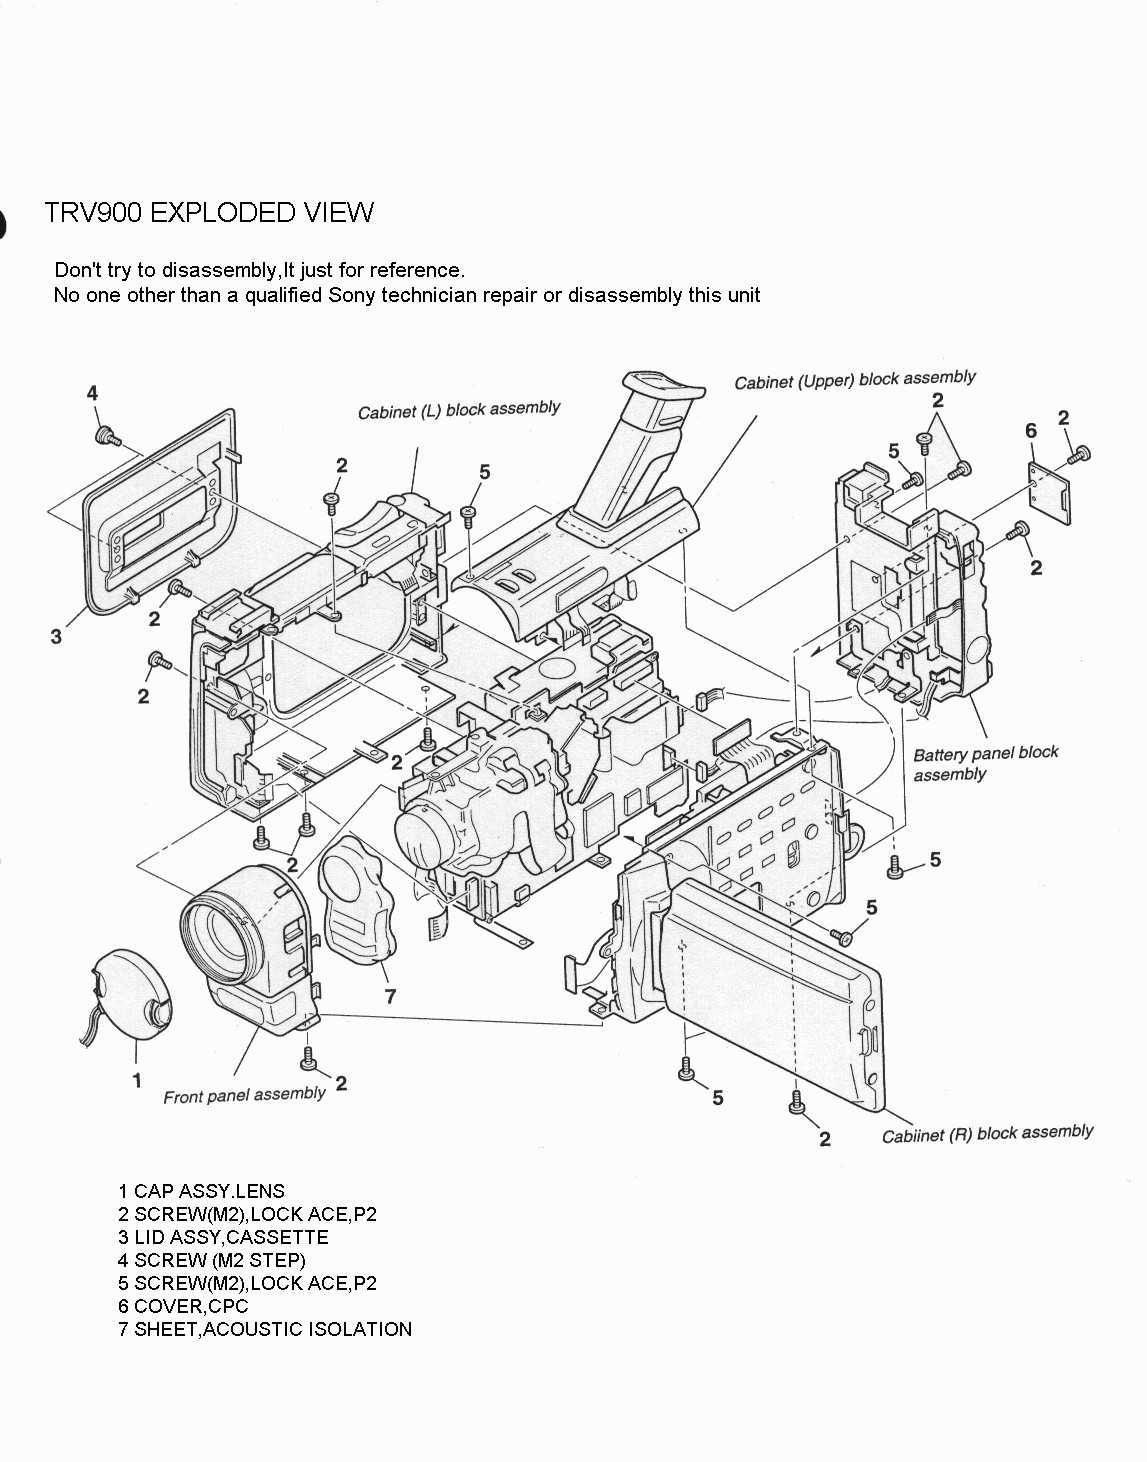 Trv900 Photo Compare